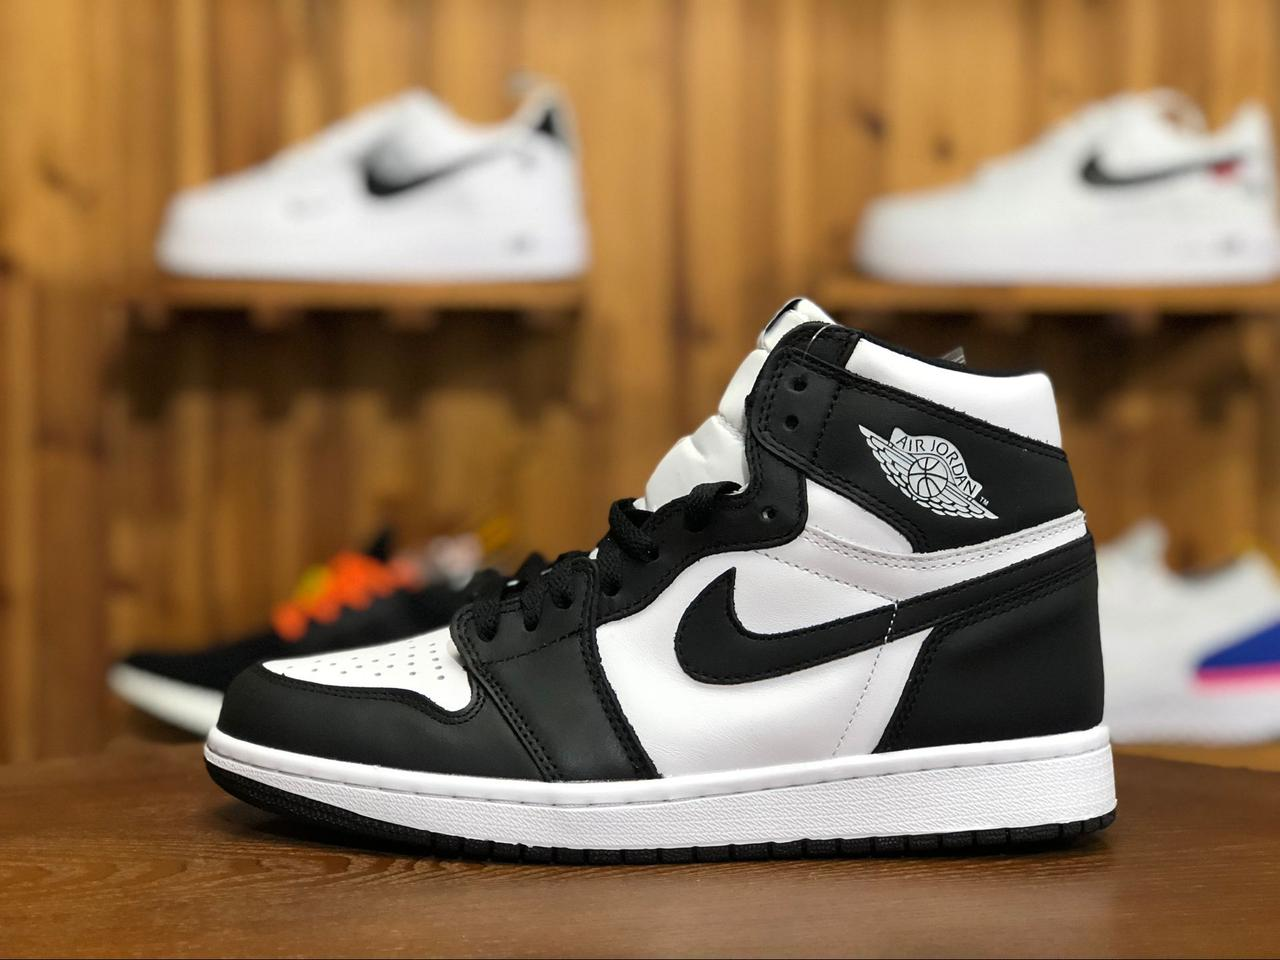 ae84d4be Мужские Кроссовки Jordan 1 Retro High OG Black/White - Компания